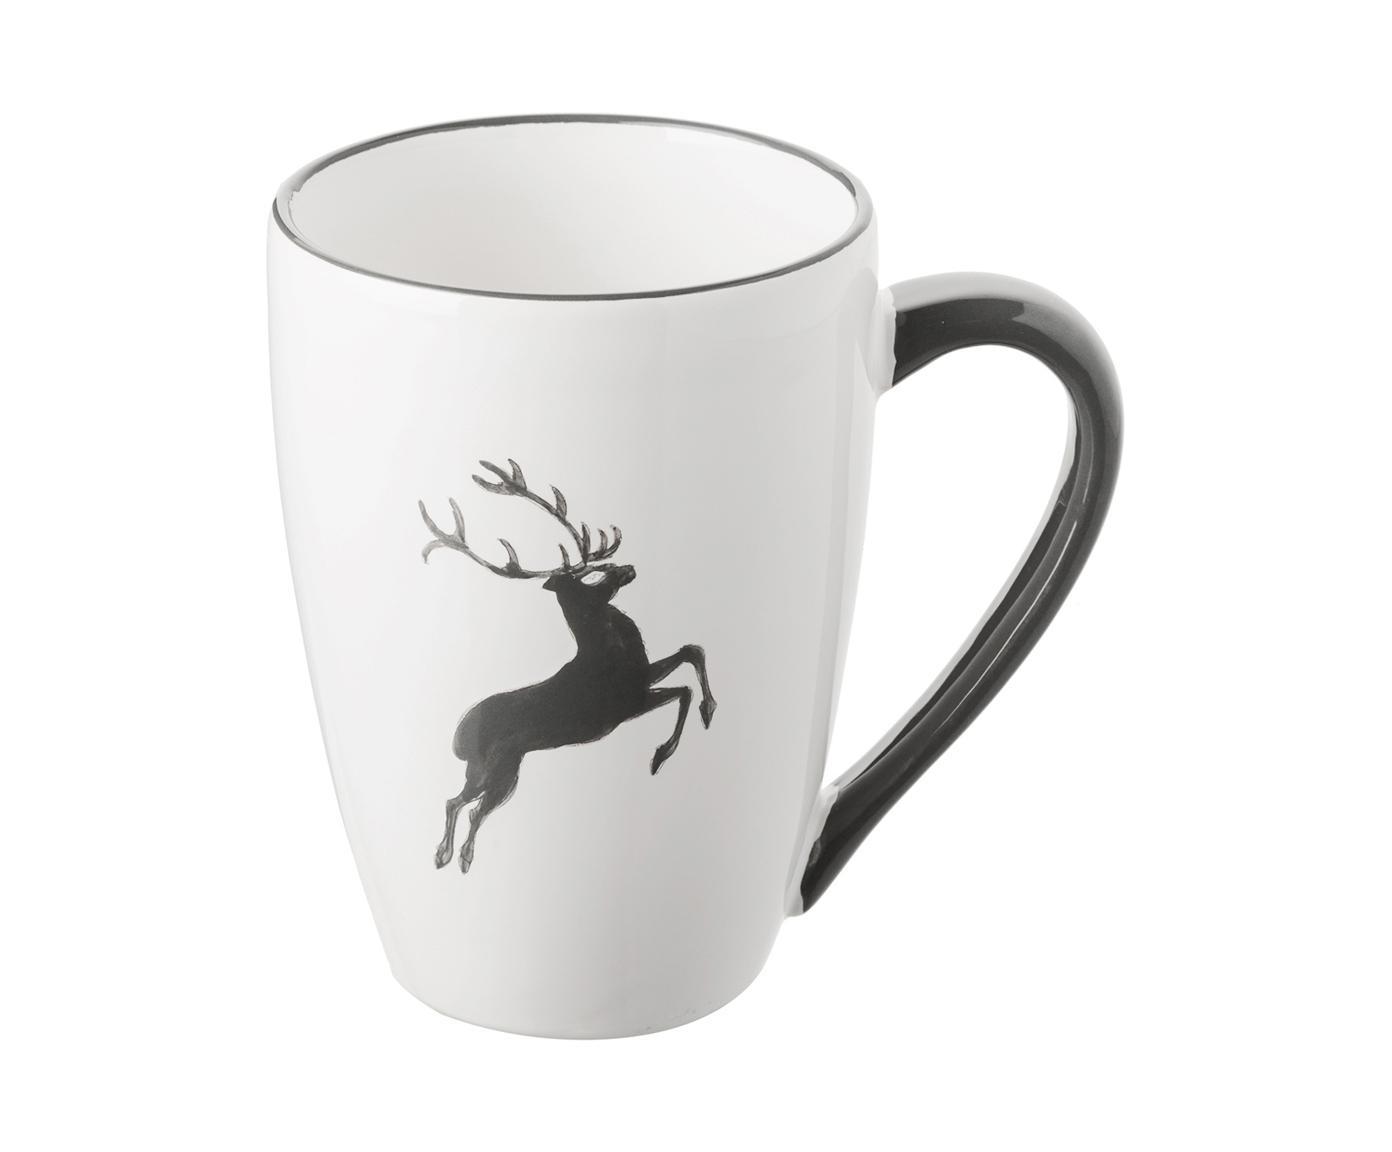 Tasse Gourmet Grauer Hirsch, Keramik, Grau,Weiß, 300 ml